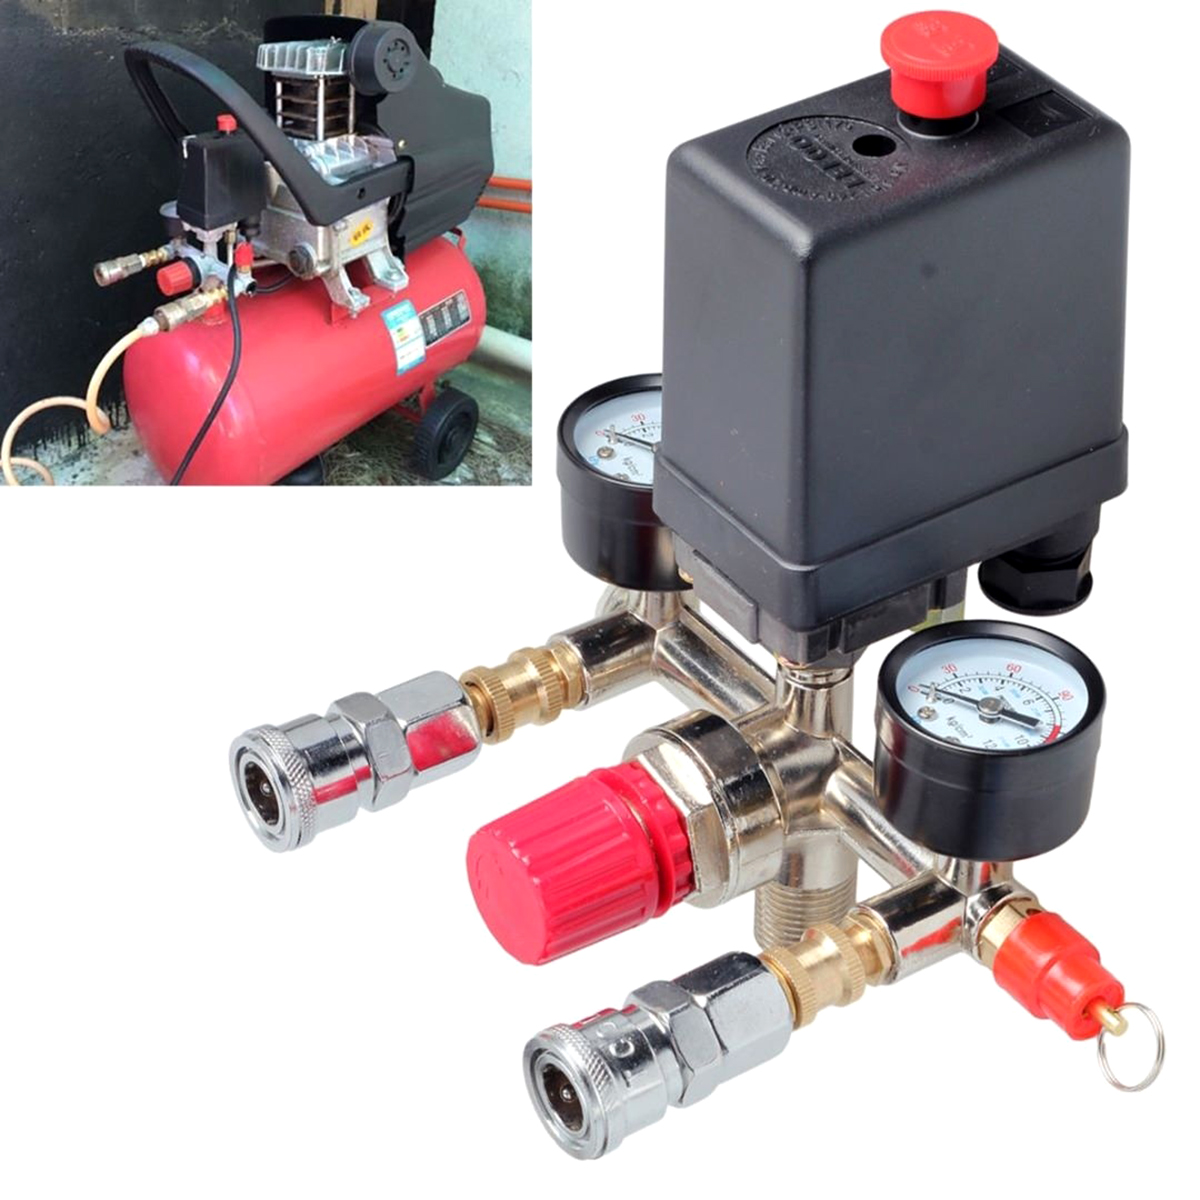 230V Pressure Switch Air Valve Manifold Air Compressor Pressure Control Regulator Gauge  Regulator Gauge With Quick Connector